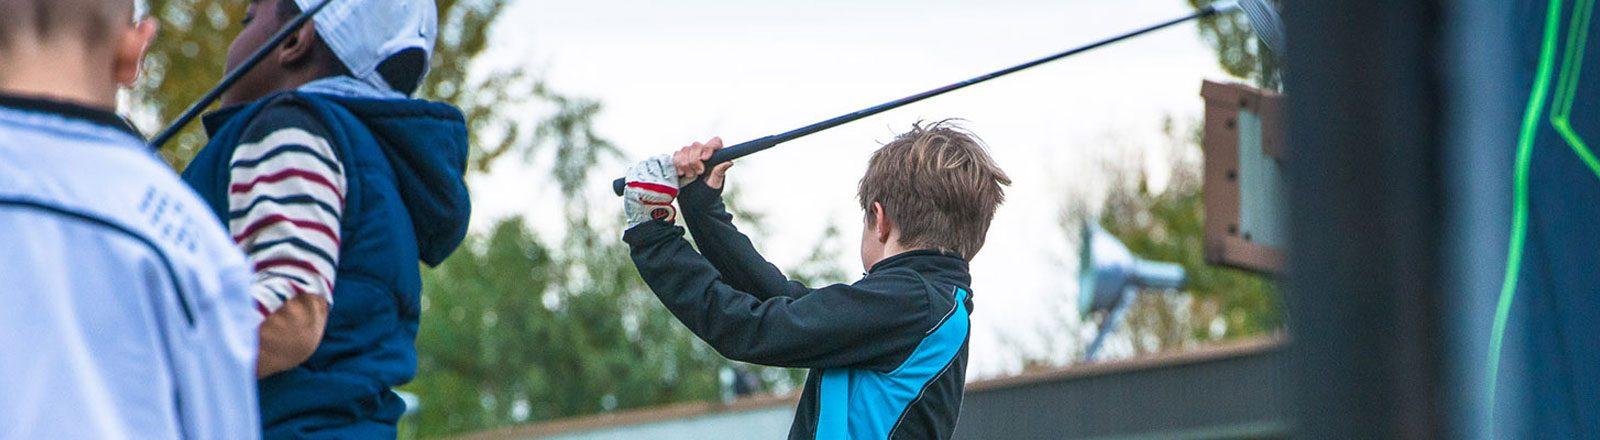 Junior Golf Swing